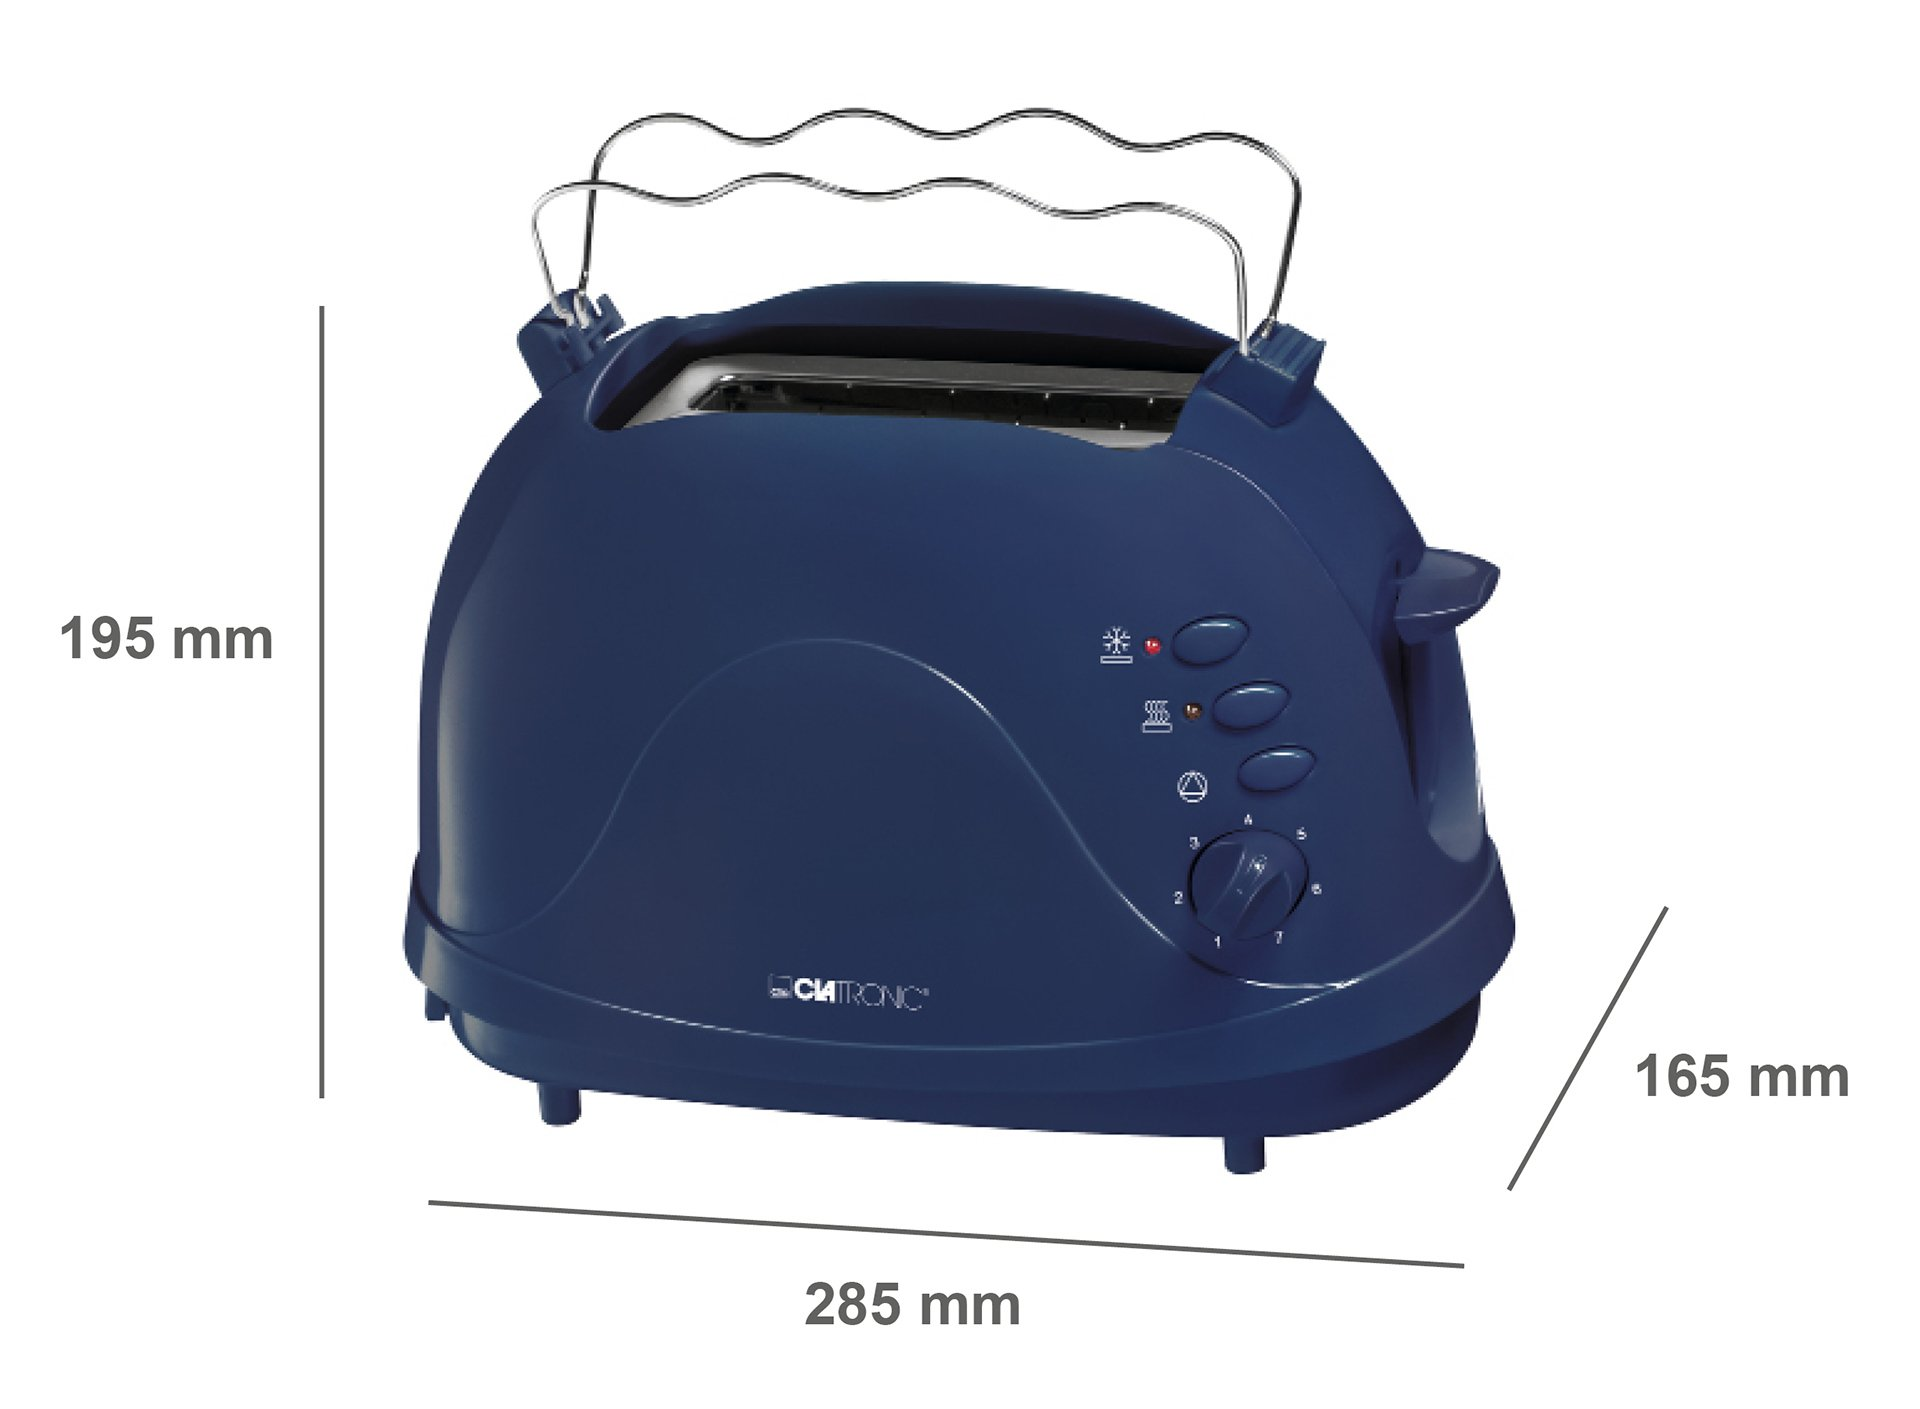 Reality-Leuchten-LED-Deckenleuchte-EEK-A-chrom-inkl-12W-LED-Durchmesser-44-cm-R62703106